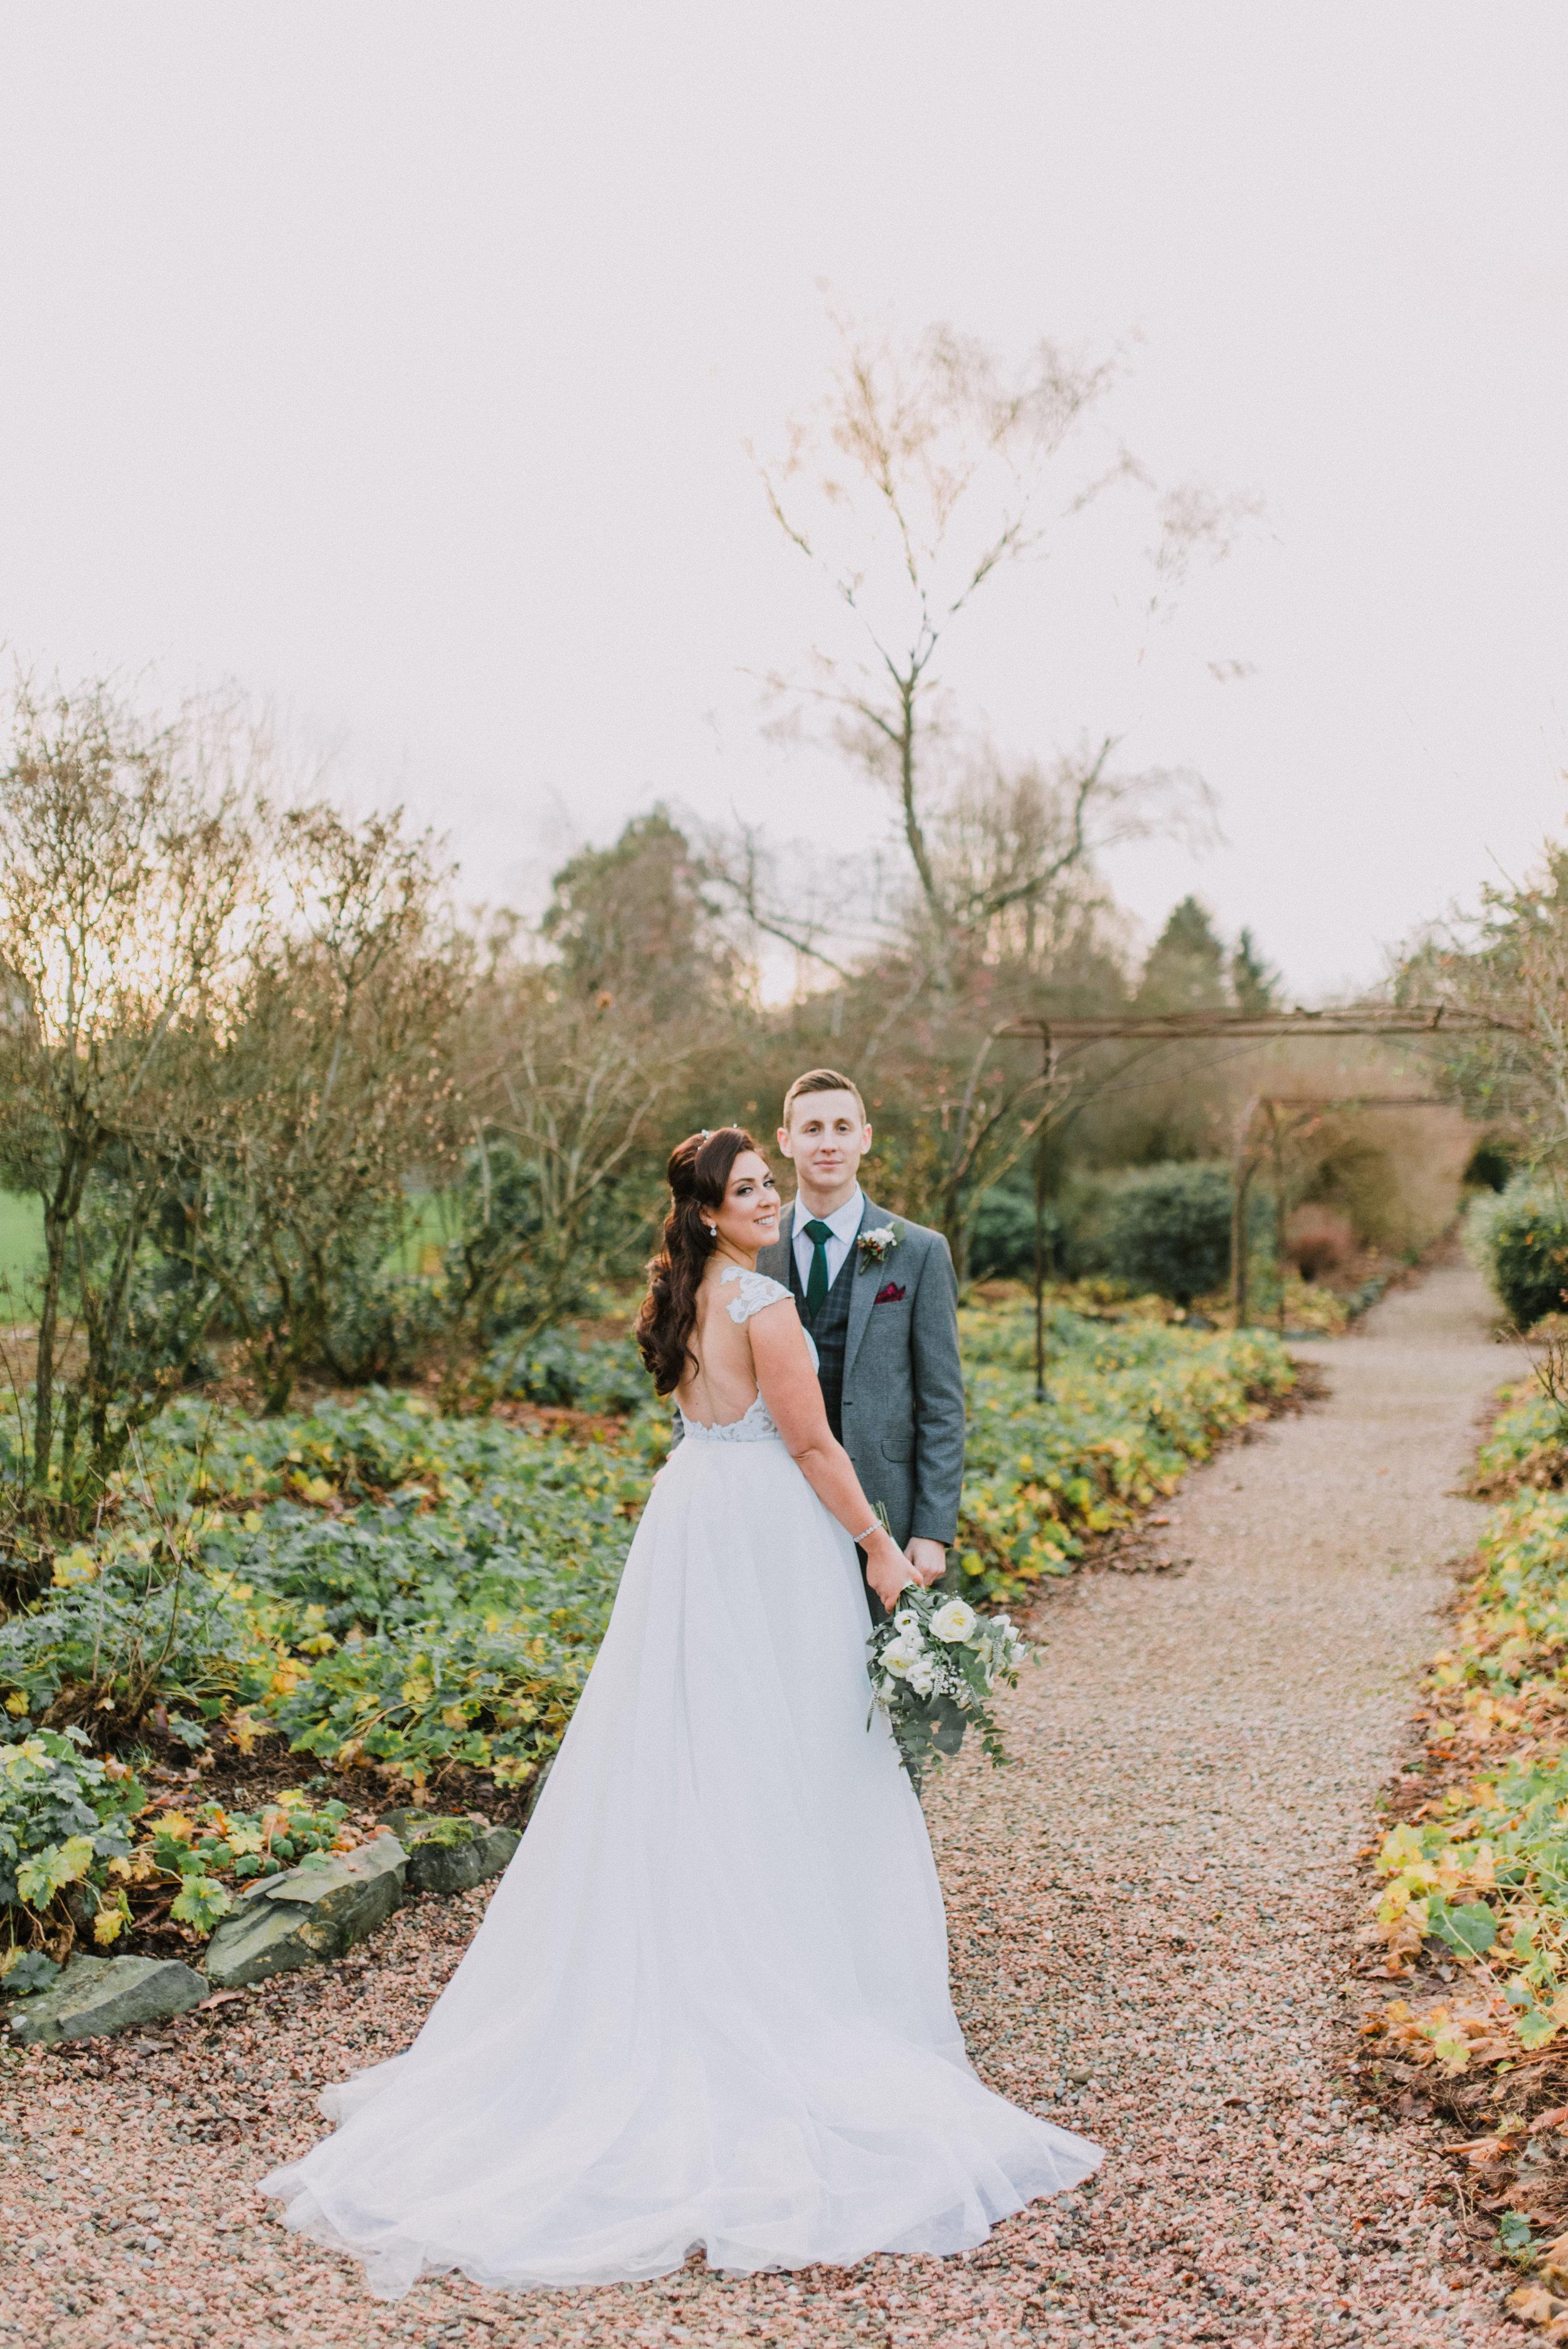 larchfield estate wedding, wedding venues northern ireland, barn wedding venues northern ireland, quirky weddings ni, wedding photos larchfield estate, shane todd wedding, best wedding venues n (7).jpg